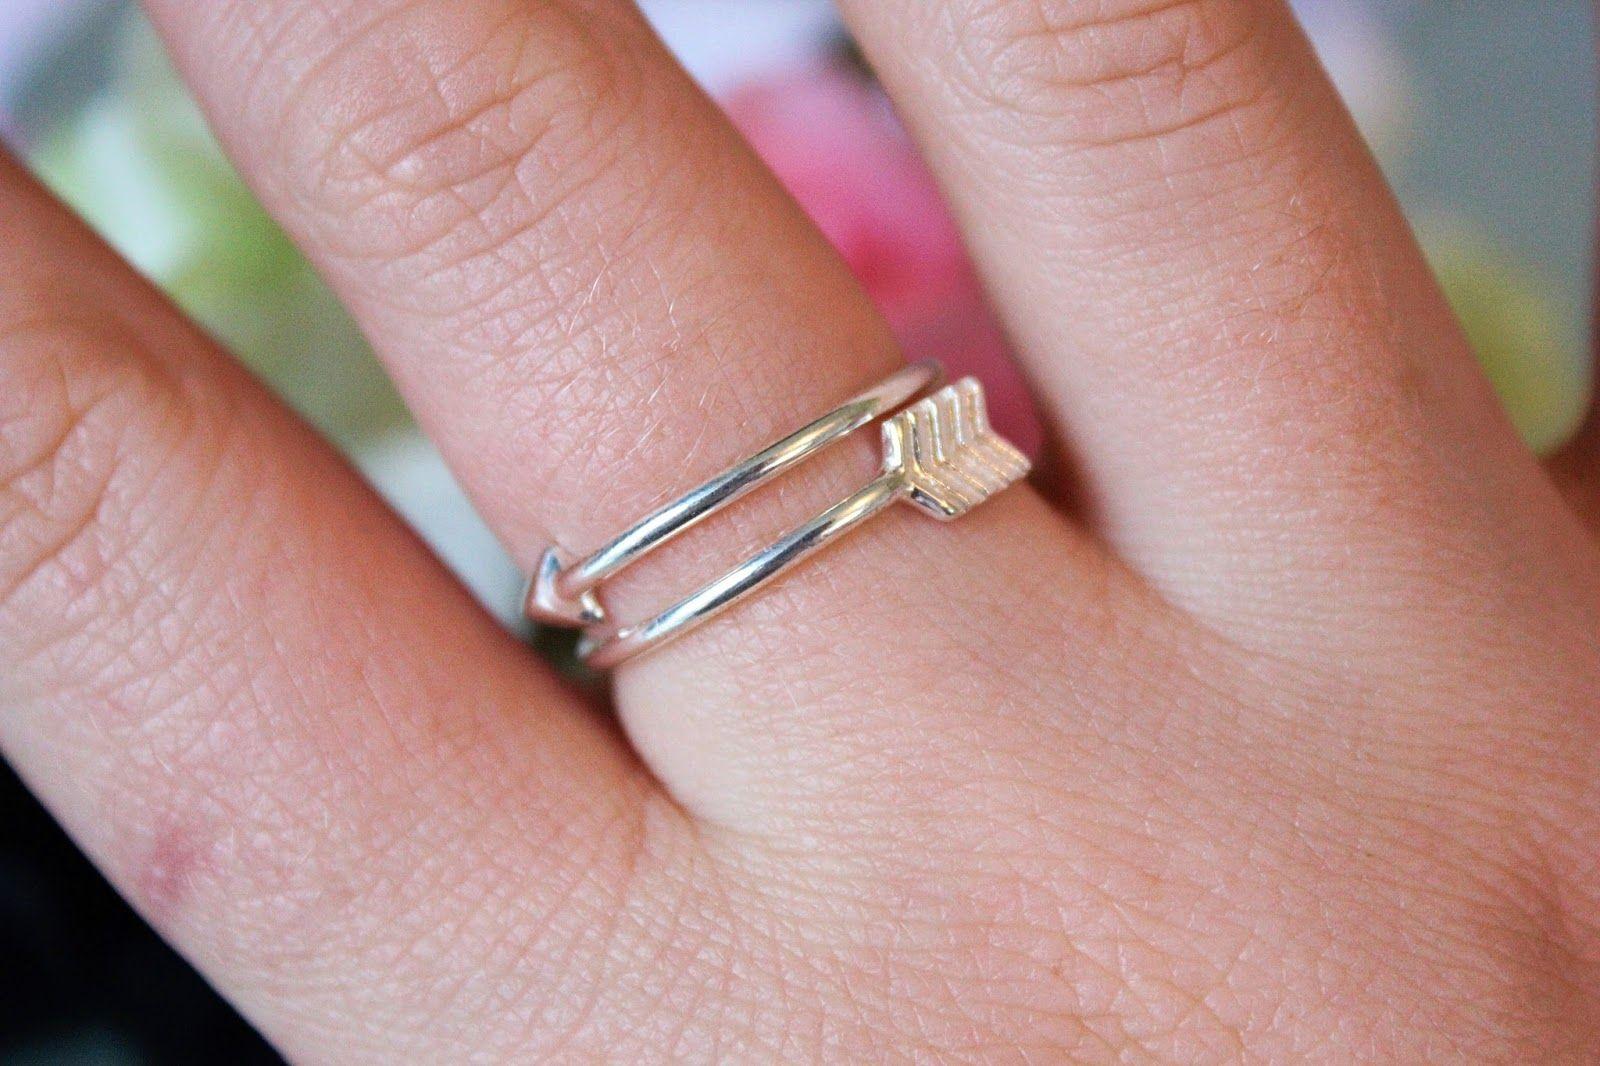 tiny arrow love tattoo - Google Search | Wedding Band Tattoo ...